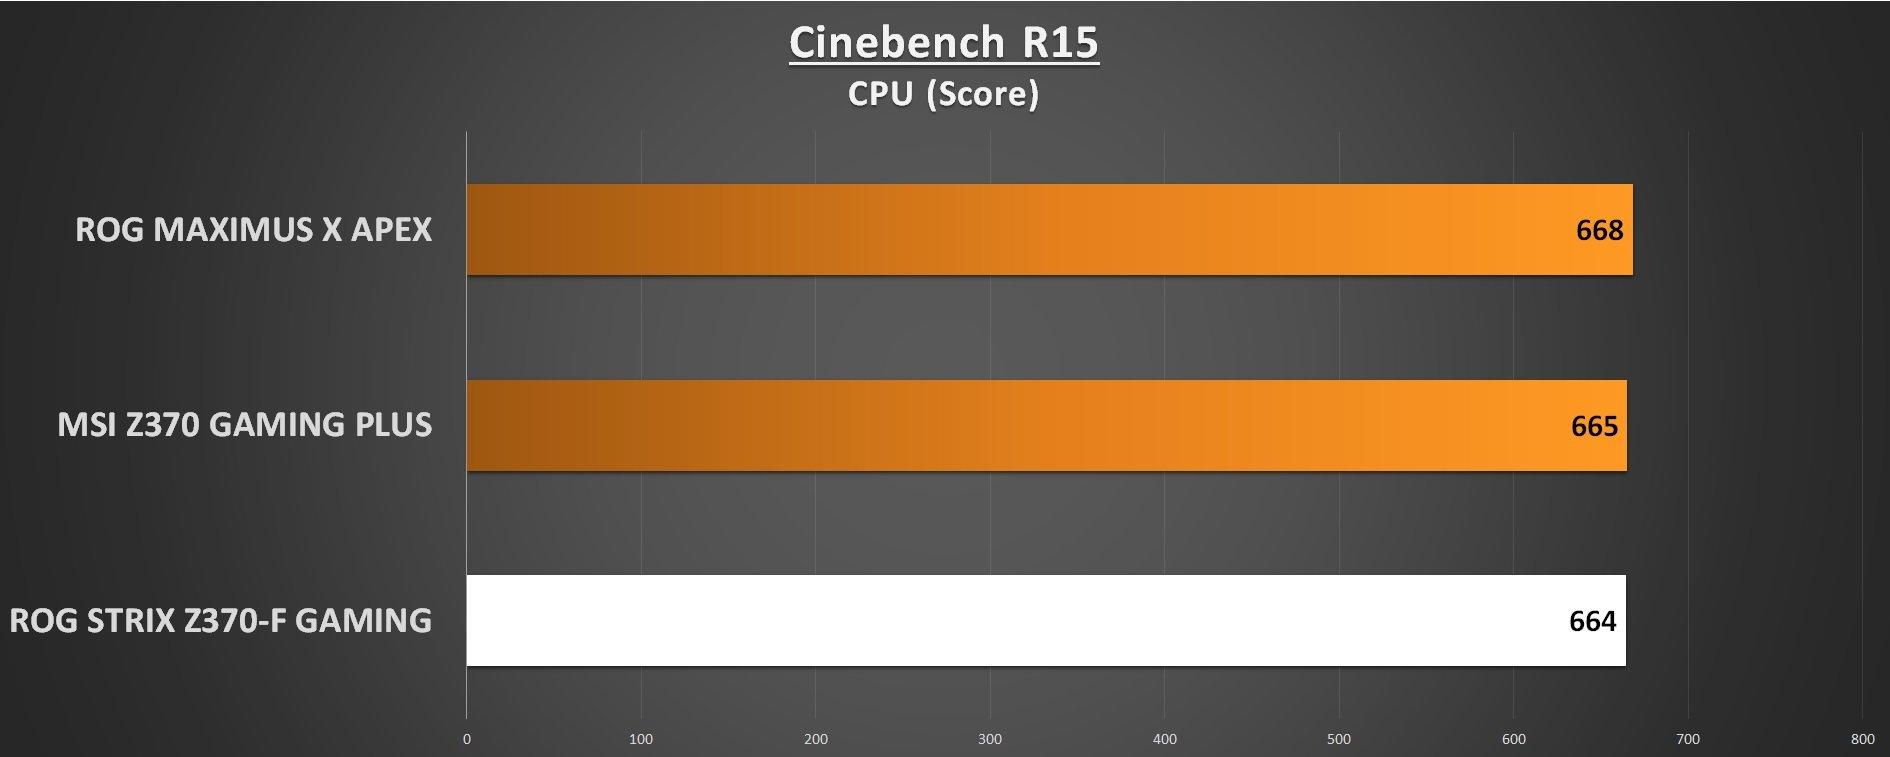 ROG STRIX Z370-F Gaming Cinebench R15 CPU Benchmark